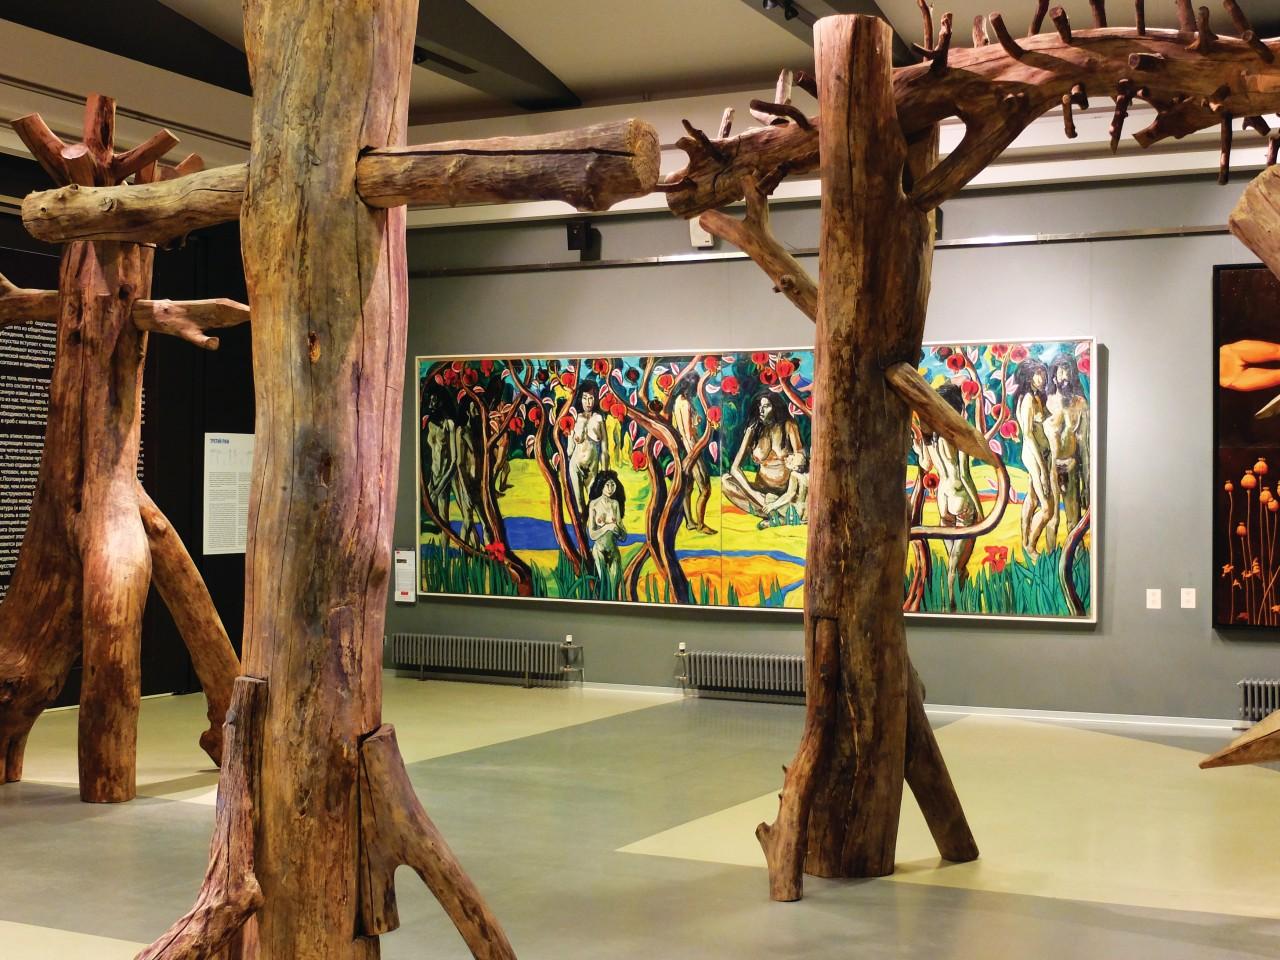 Musée d'art contemporain Erarta. (© Oxana PUSHKAREVA))